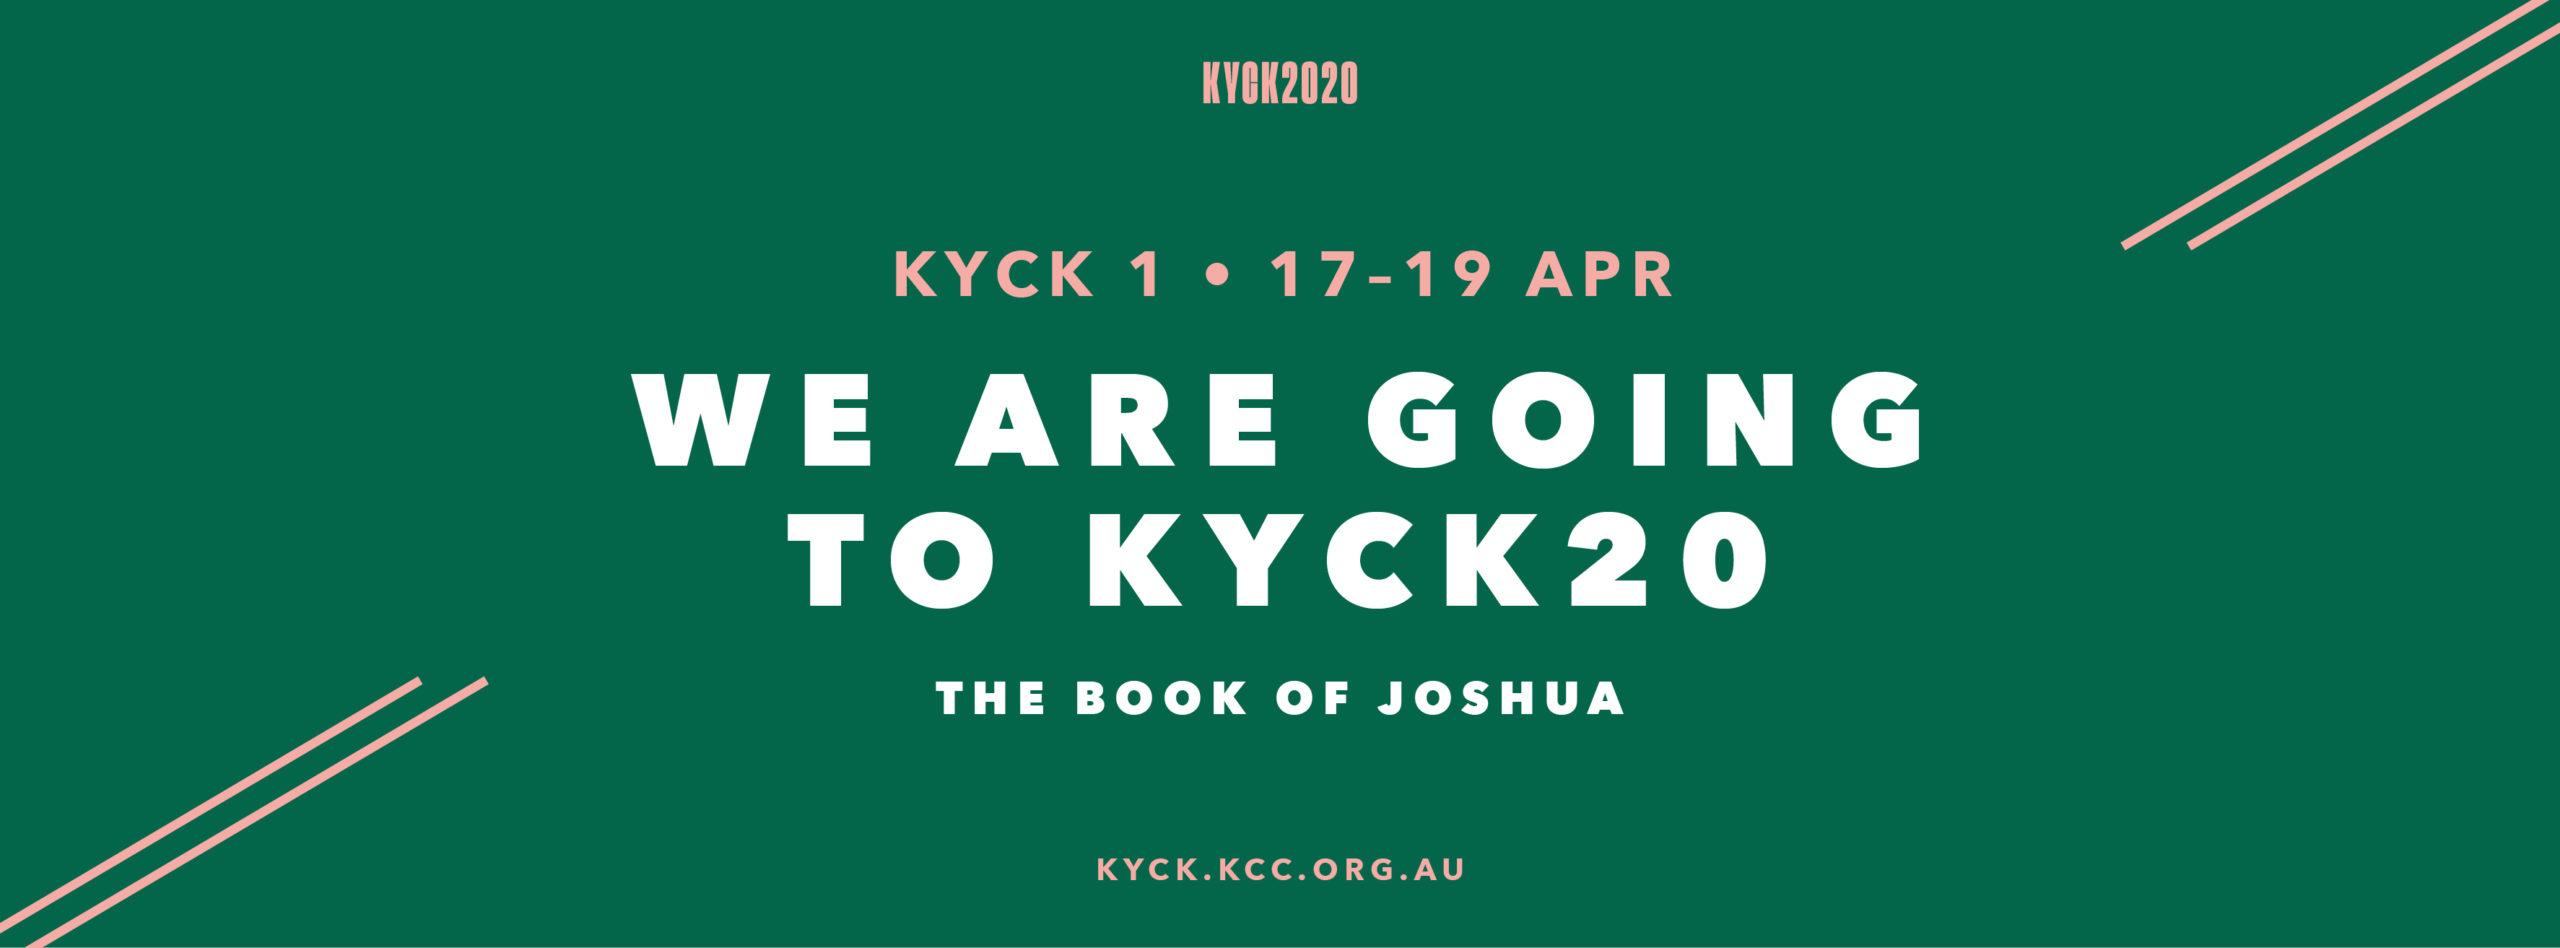 KYCK20 17-19 April 2020 – suspended